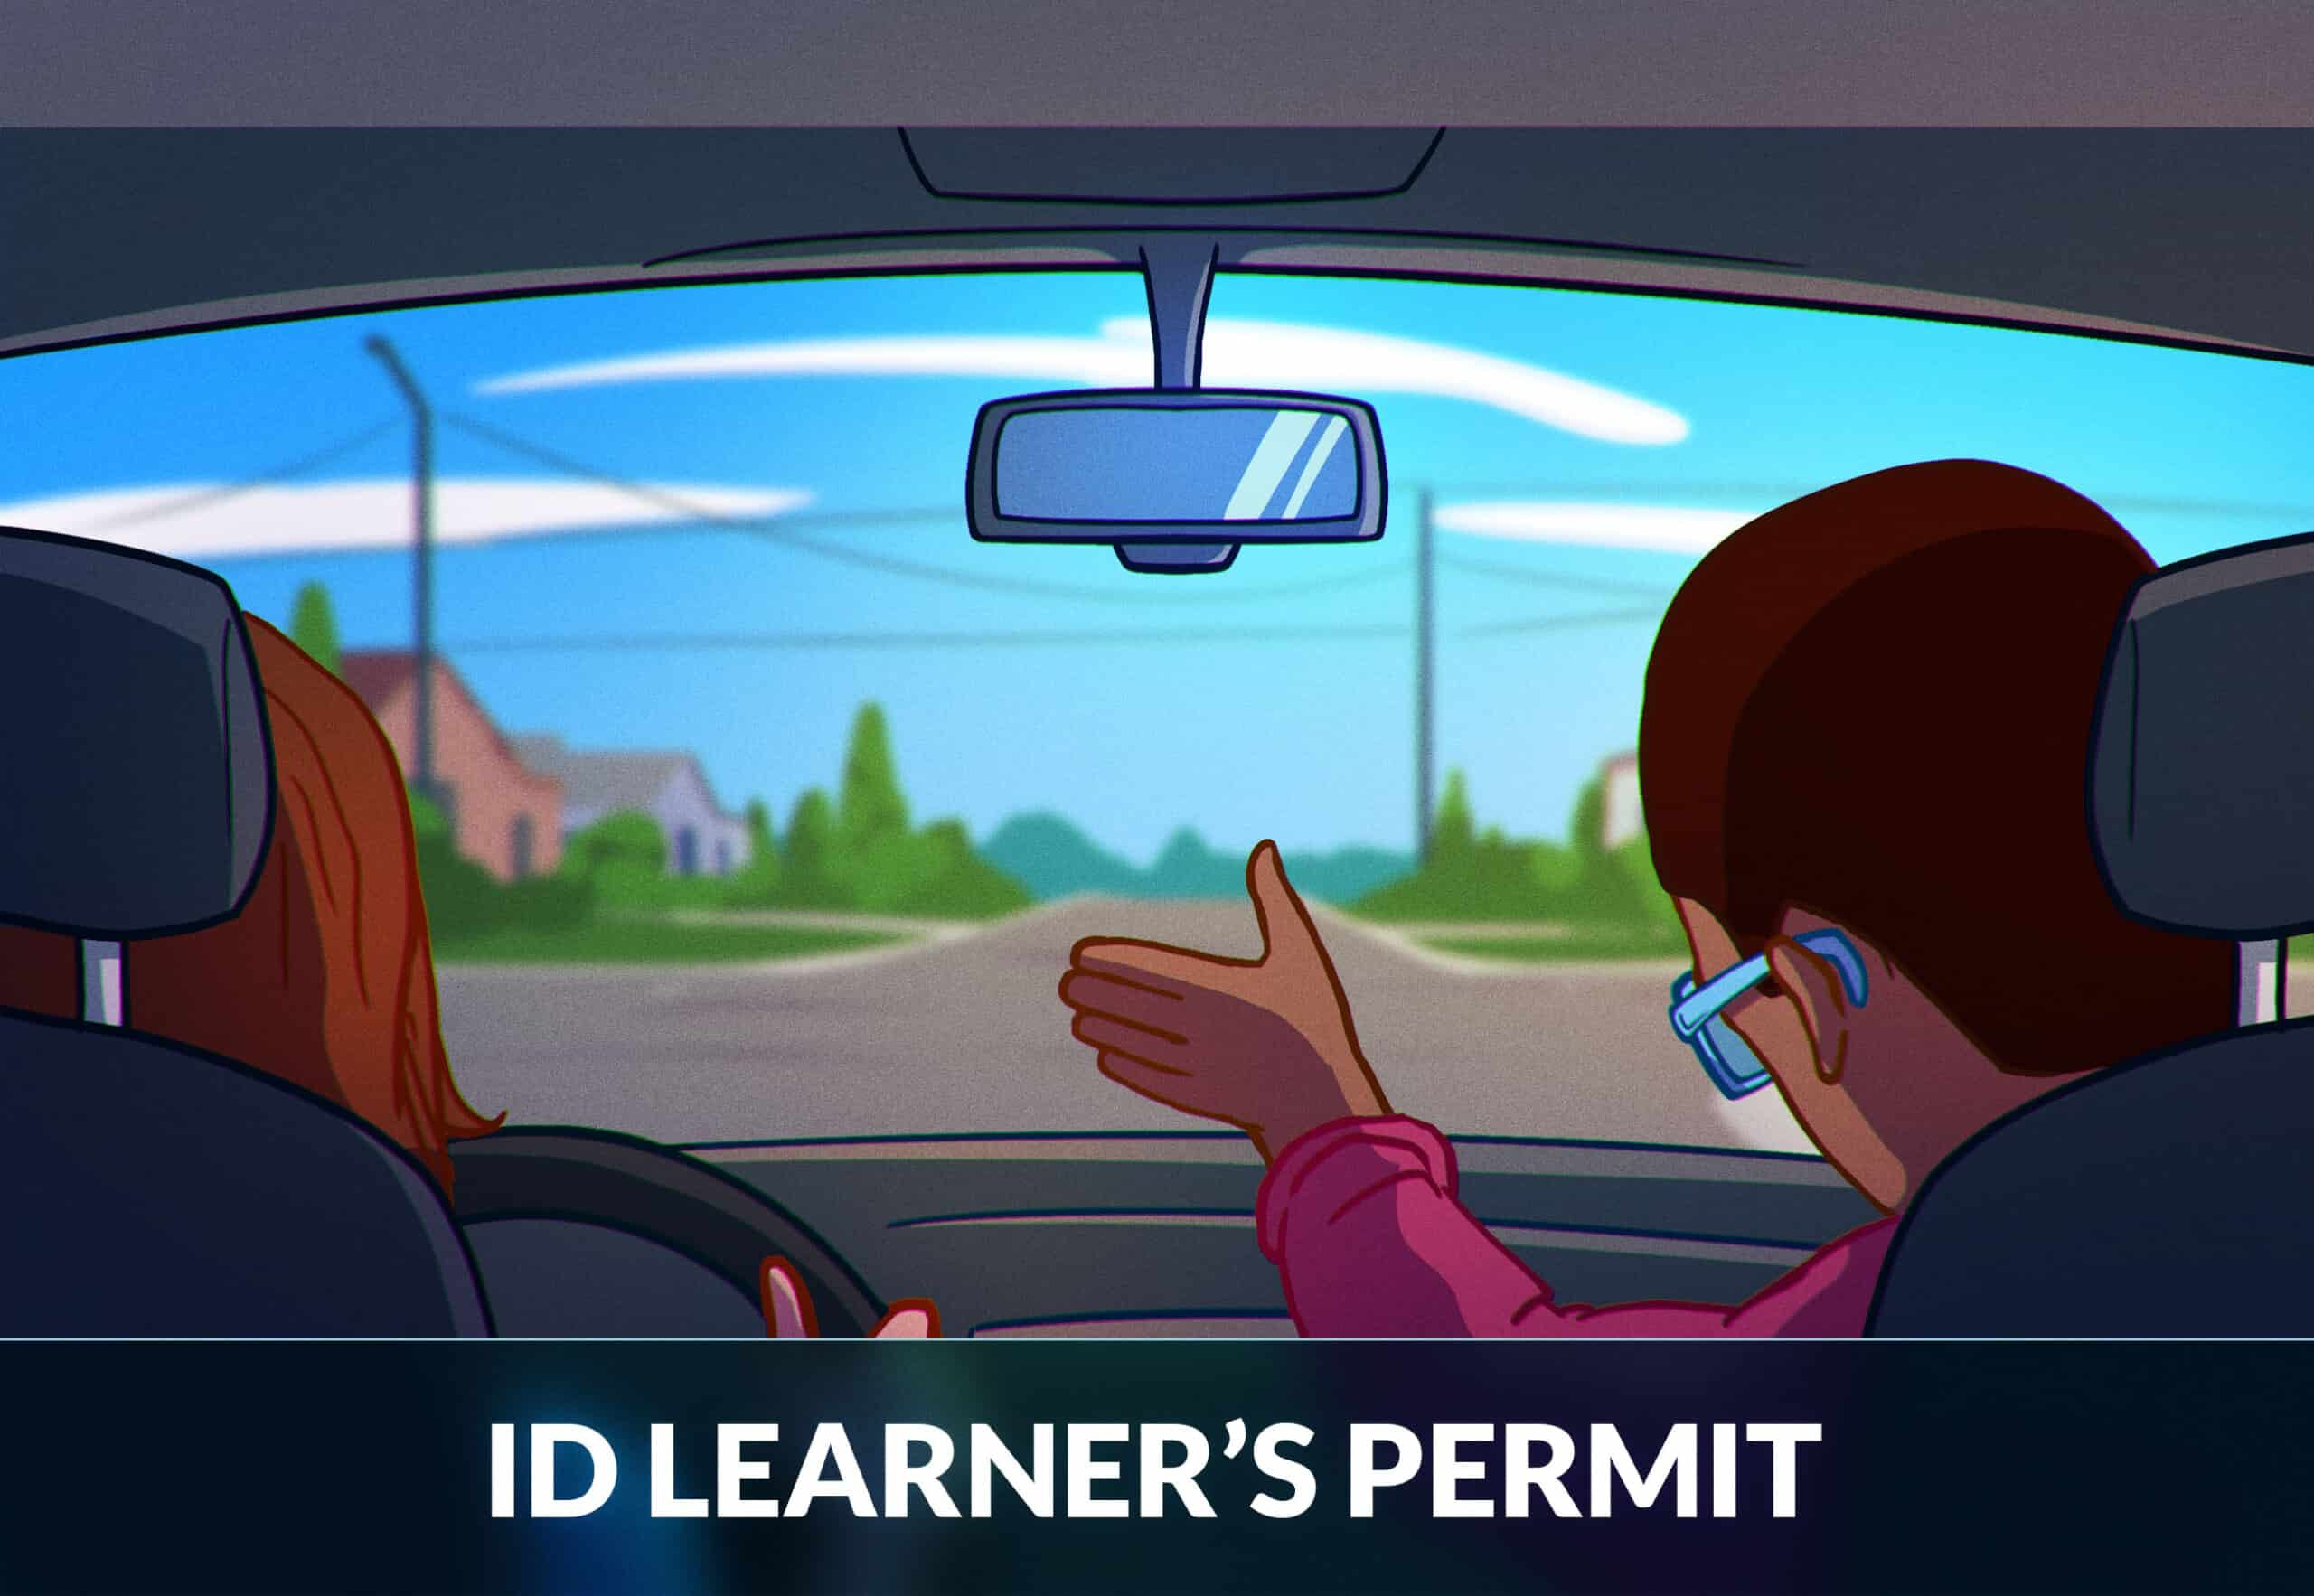 Idaho (ID) Learner's Permit